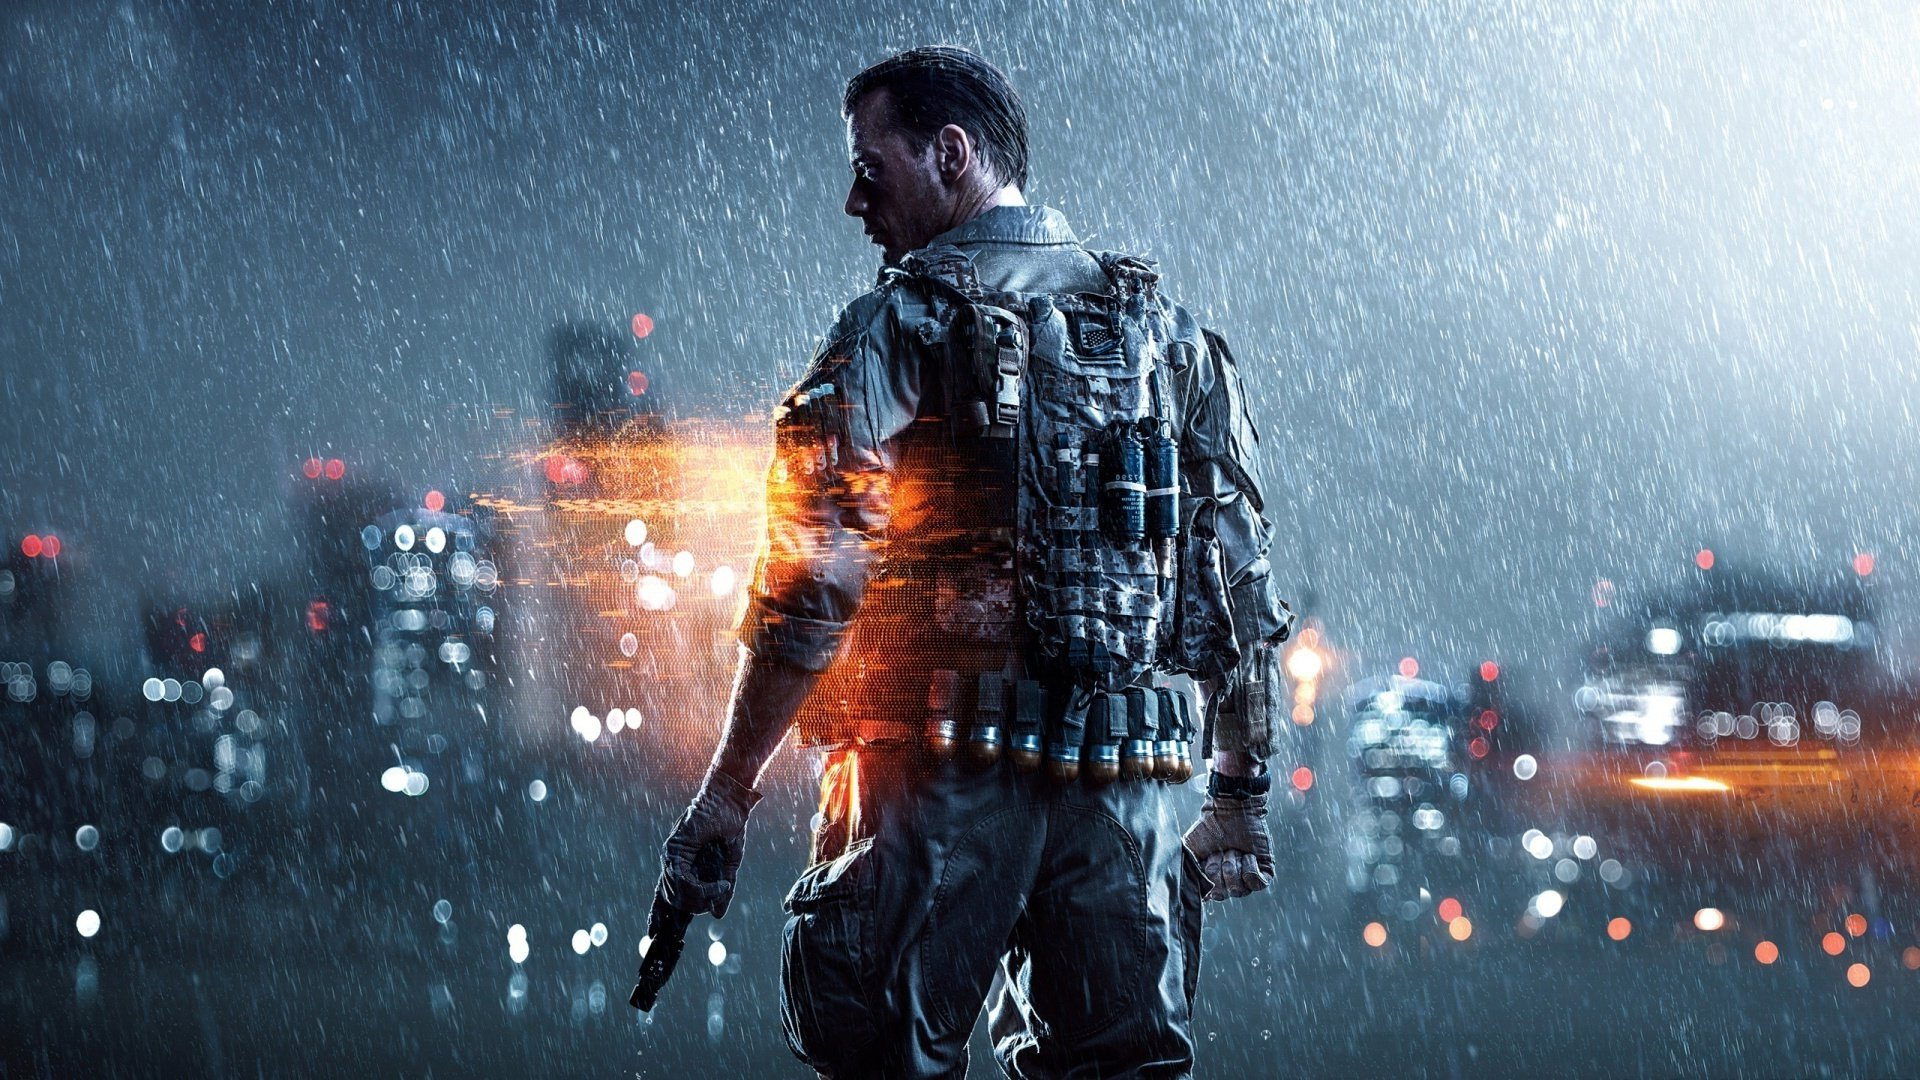 Battlefield 4 full hd wallpaper and background image 1920x1080 video game battlefield 4 wallpaper voltagebd Gallery